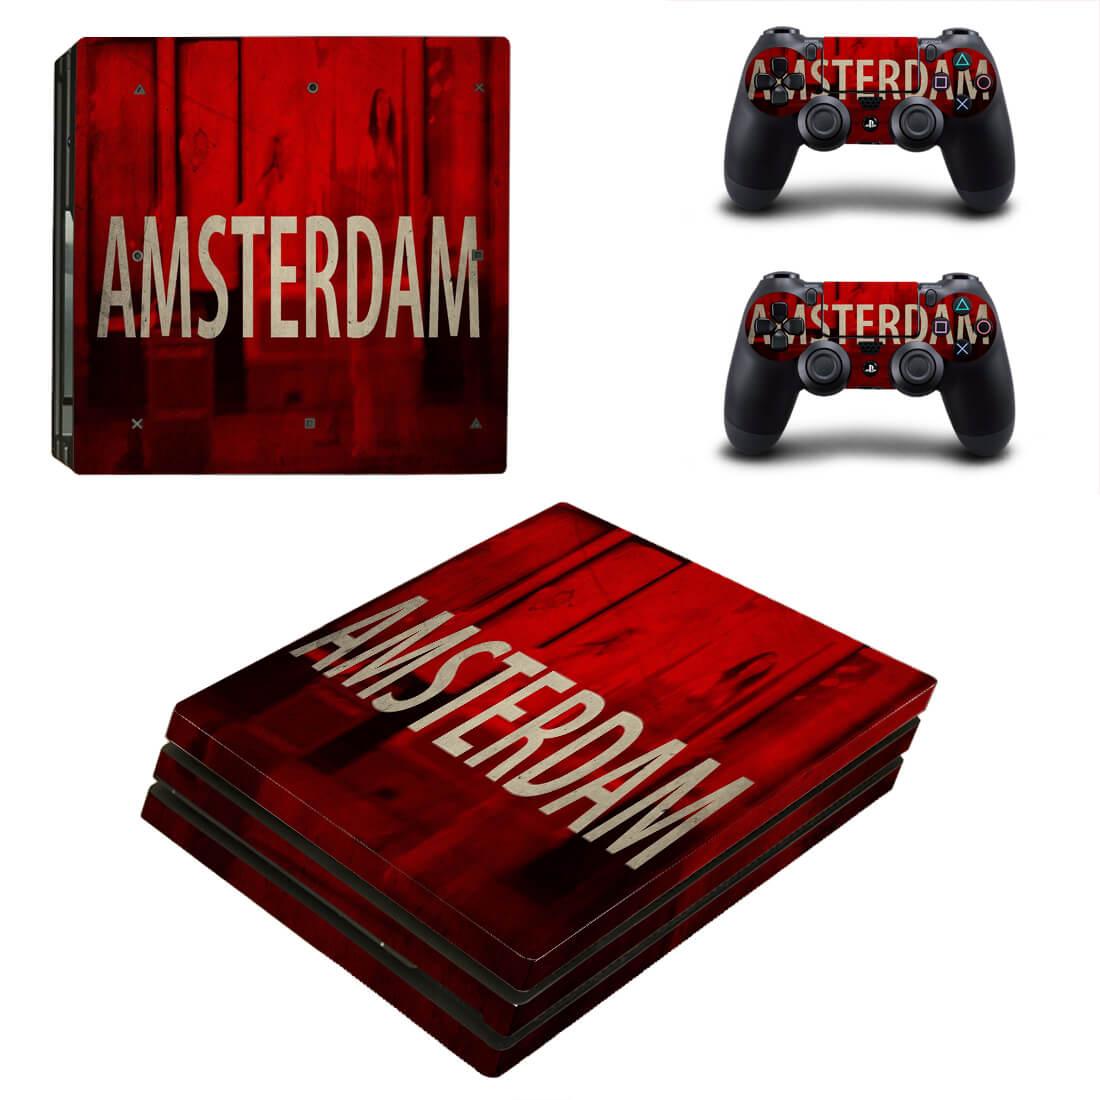 Amsterdam PS4 Pro skin